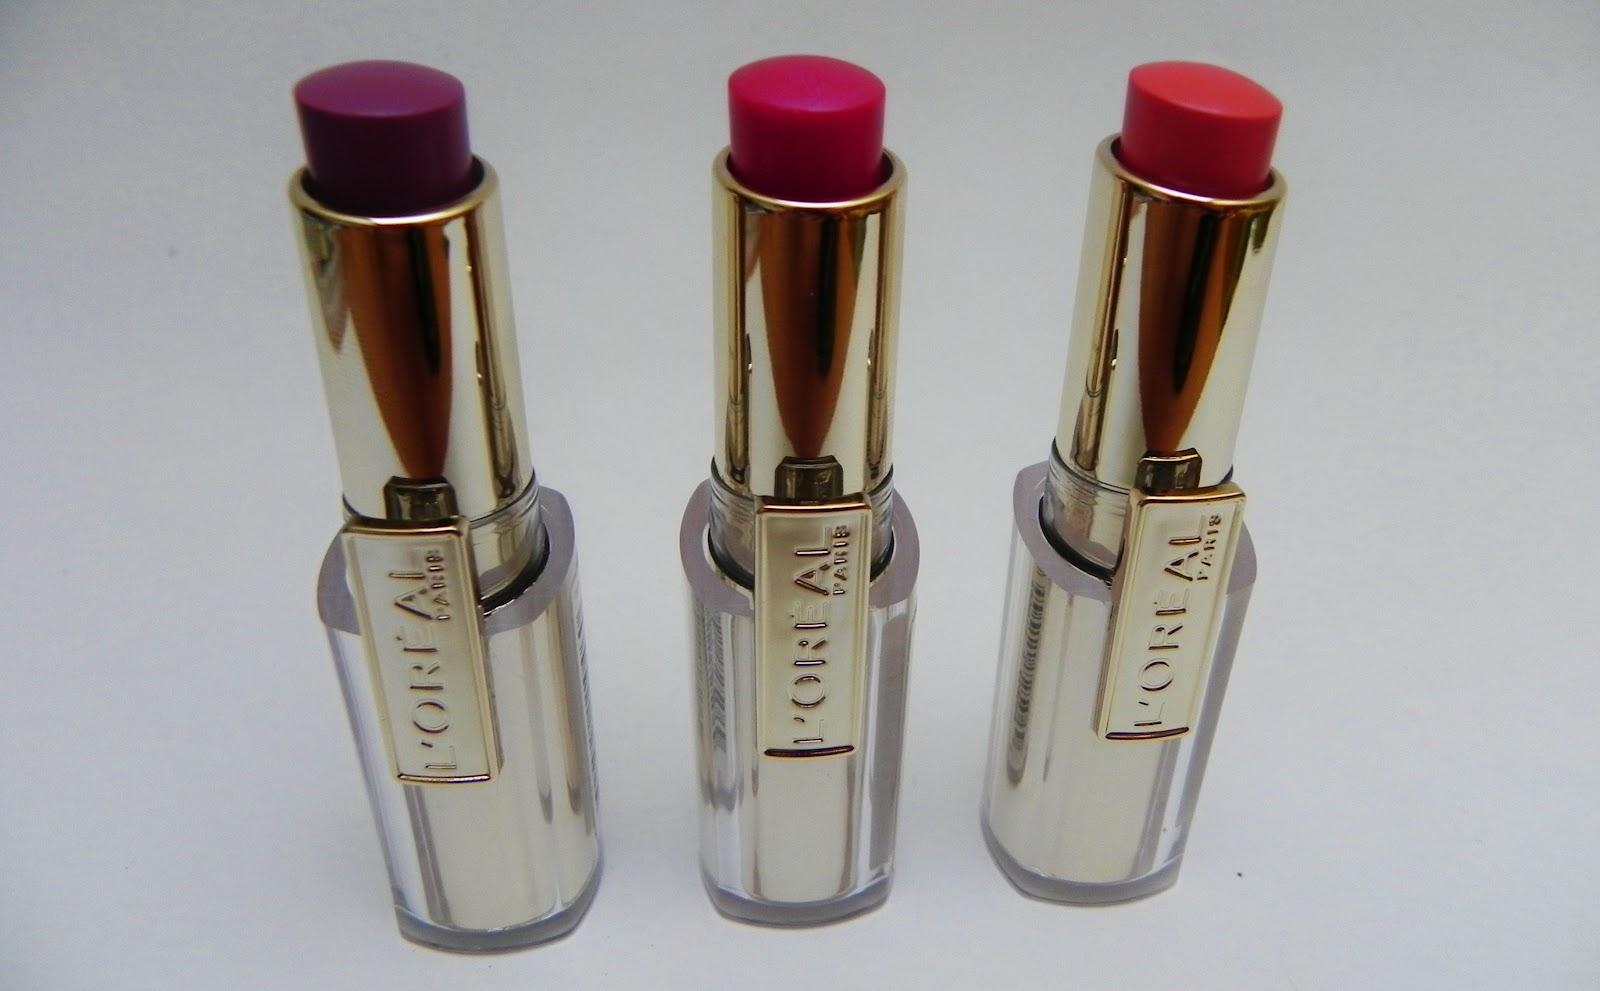 Loreal caresse lipstick dating coral